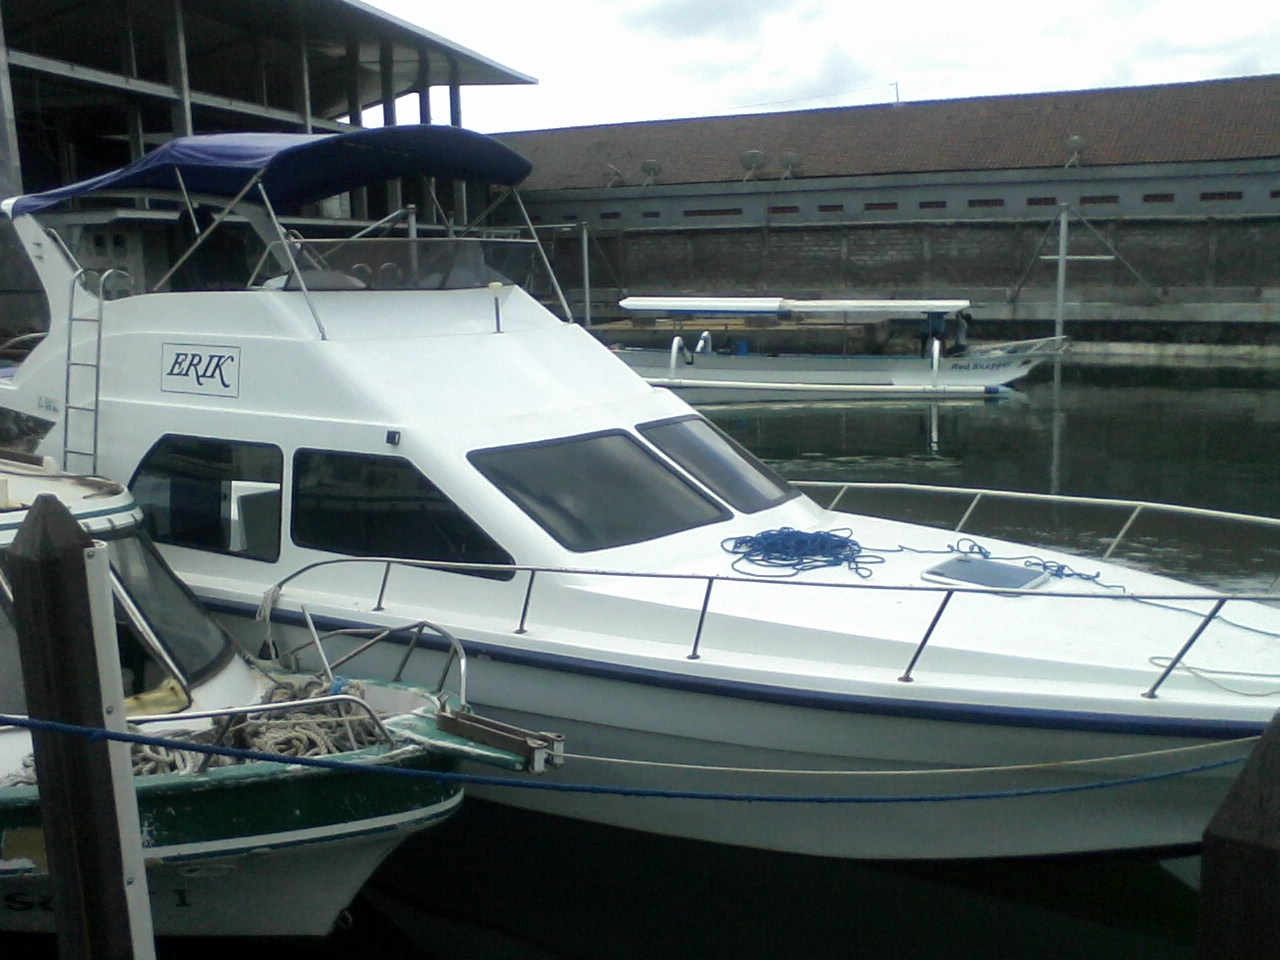 Jual Speed Boat Yamaha di Lampung